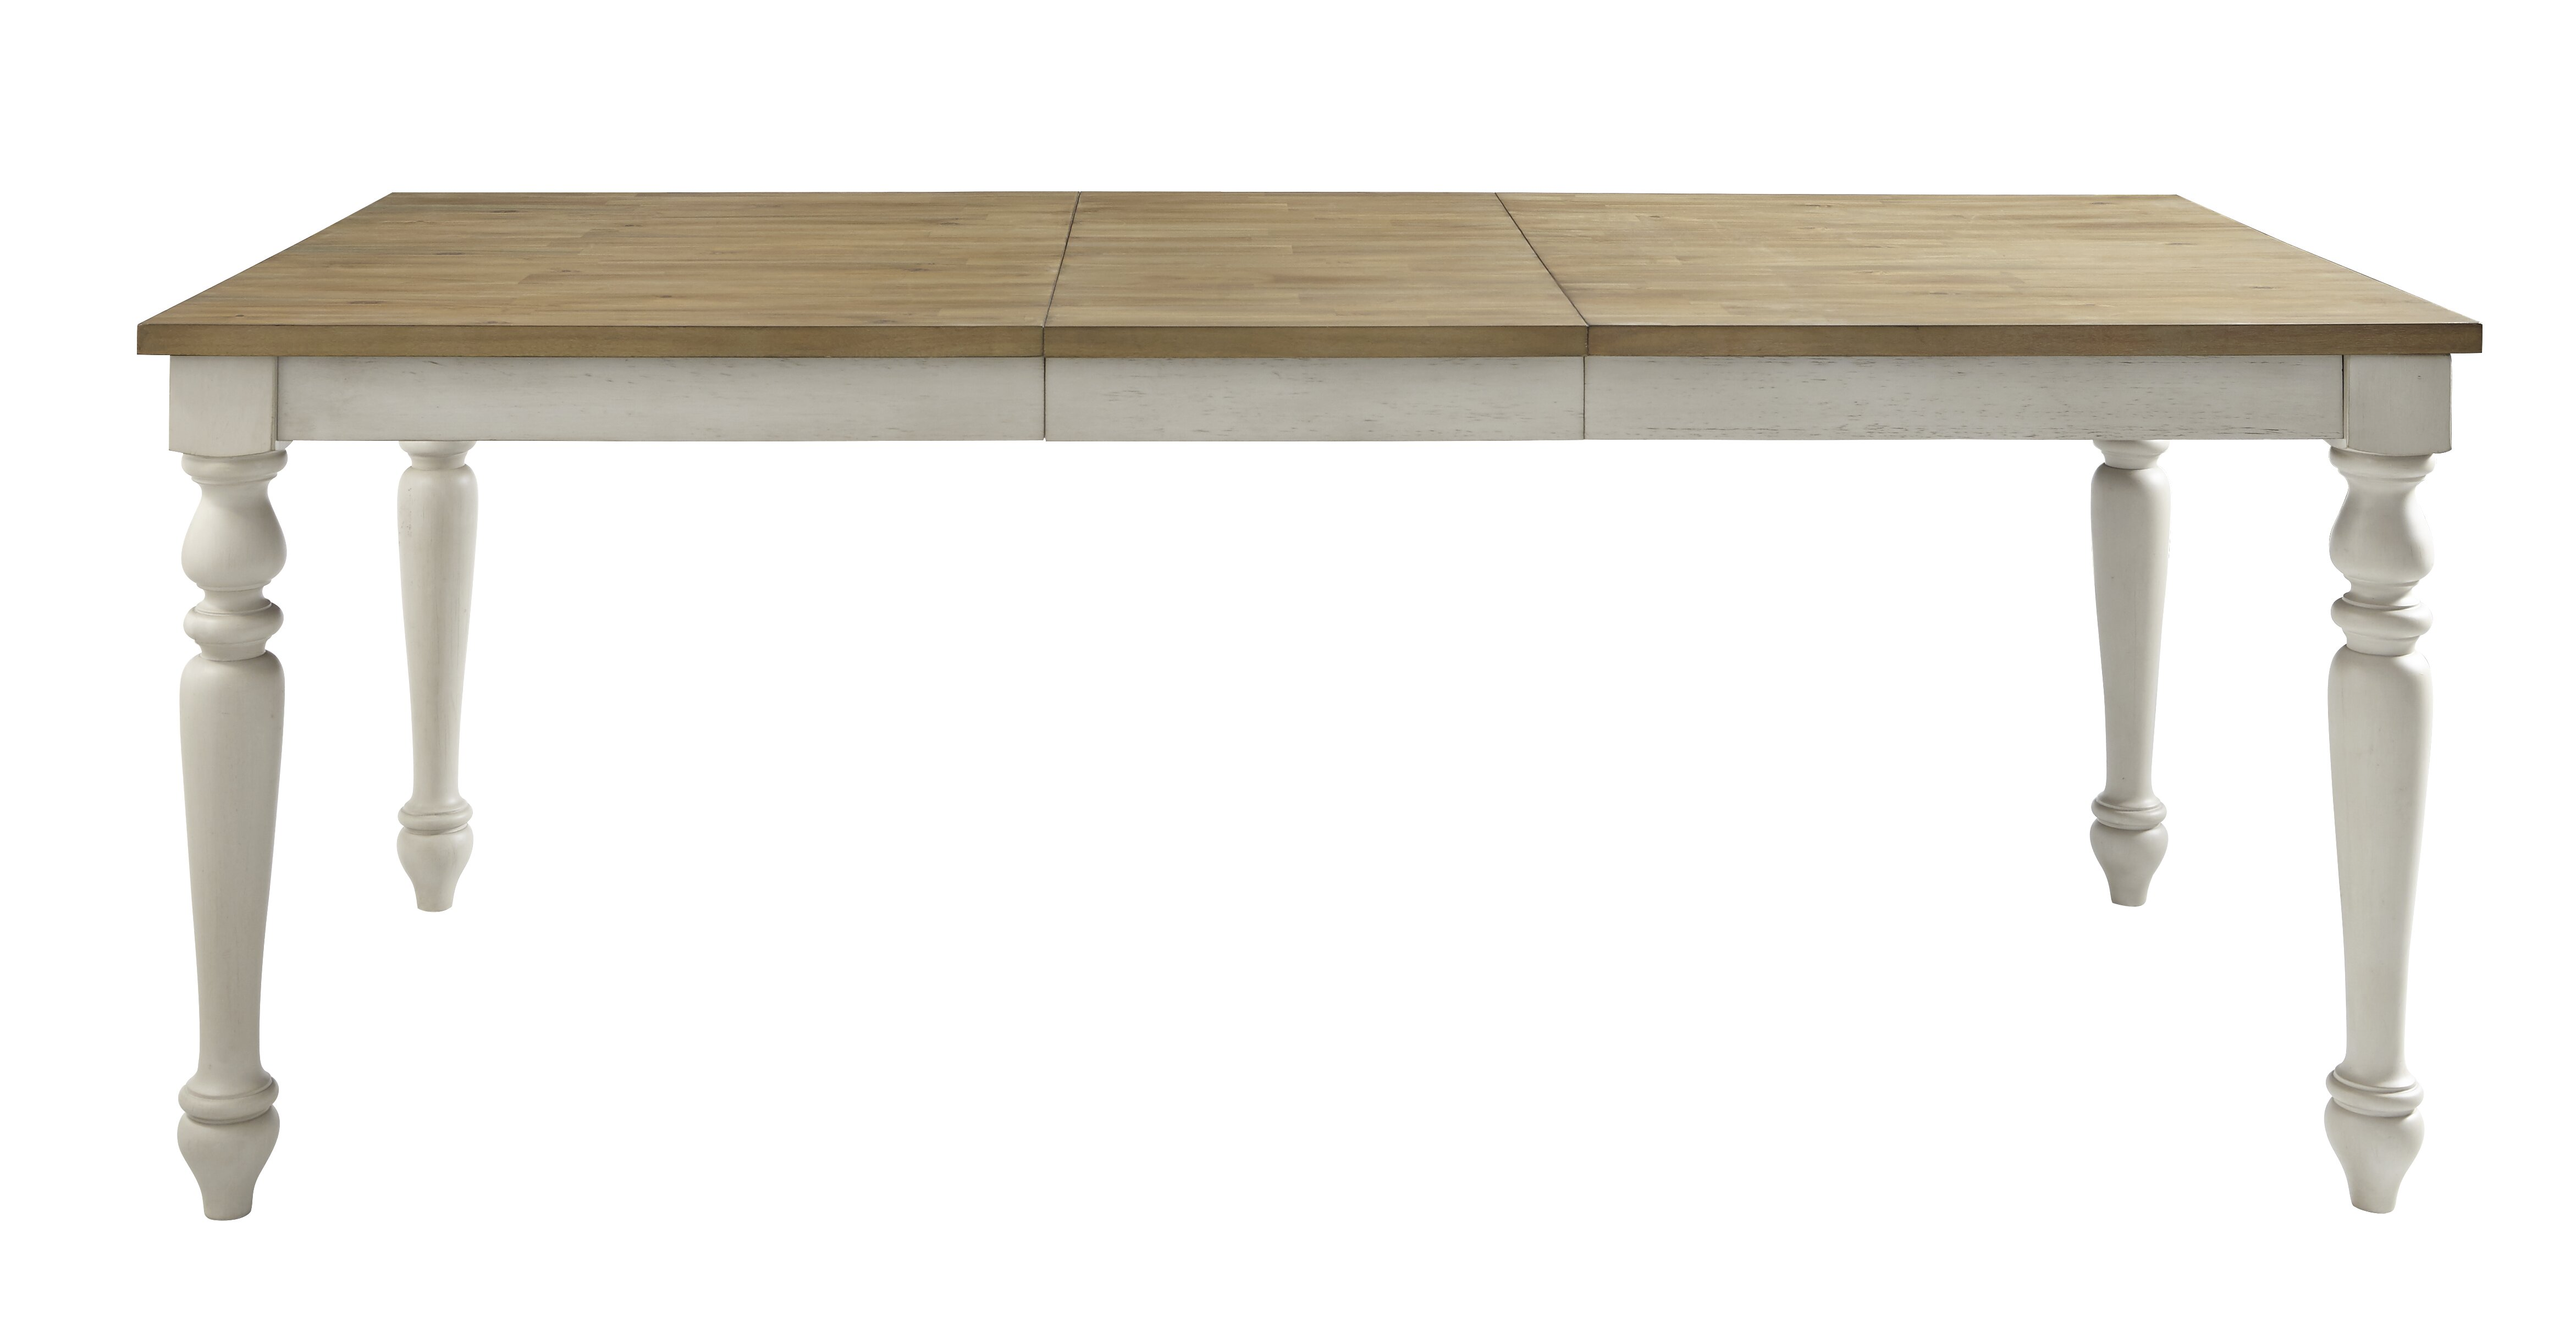 Phenomenal Togut Dining Table Interior Design Ideas Grebswwsoteloinfo